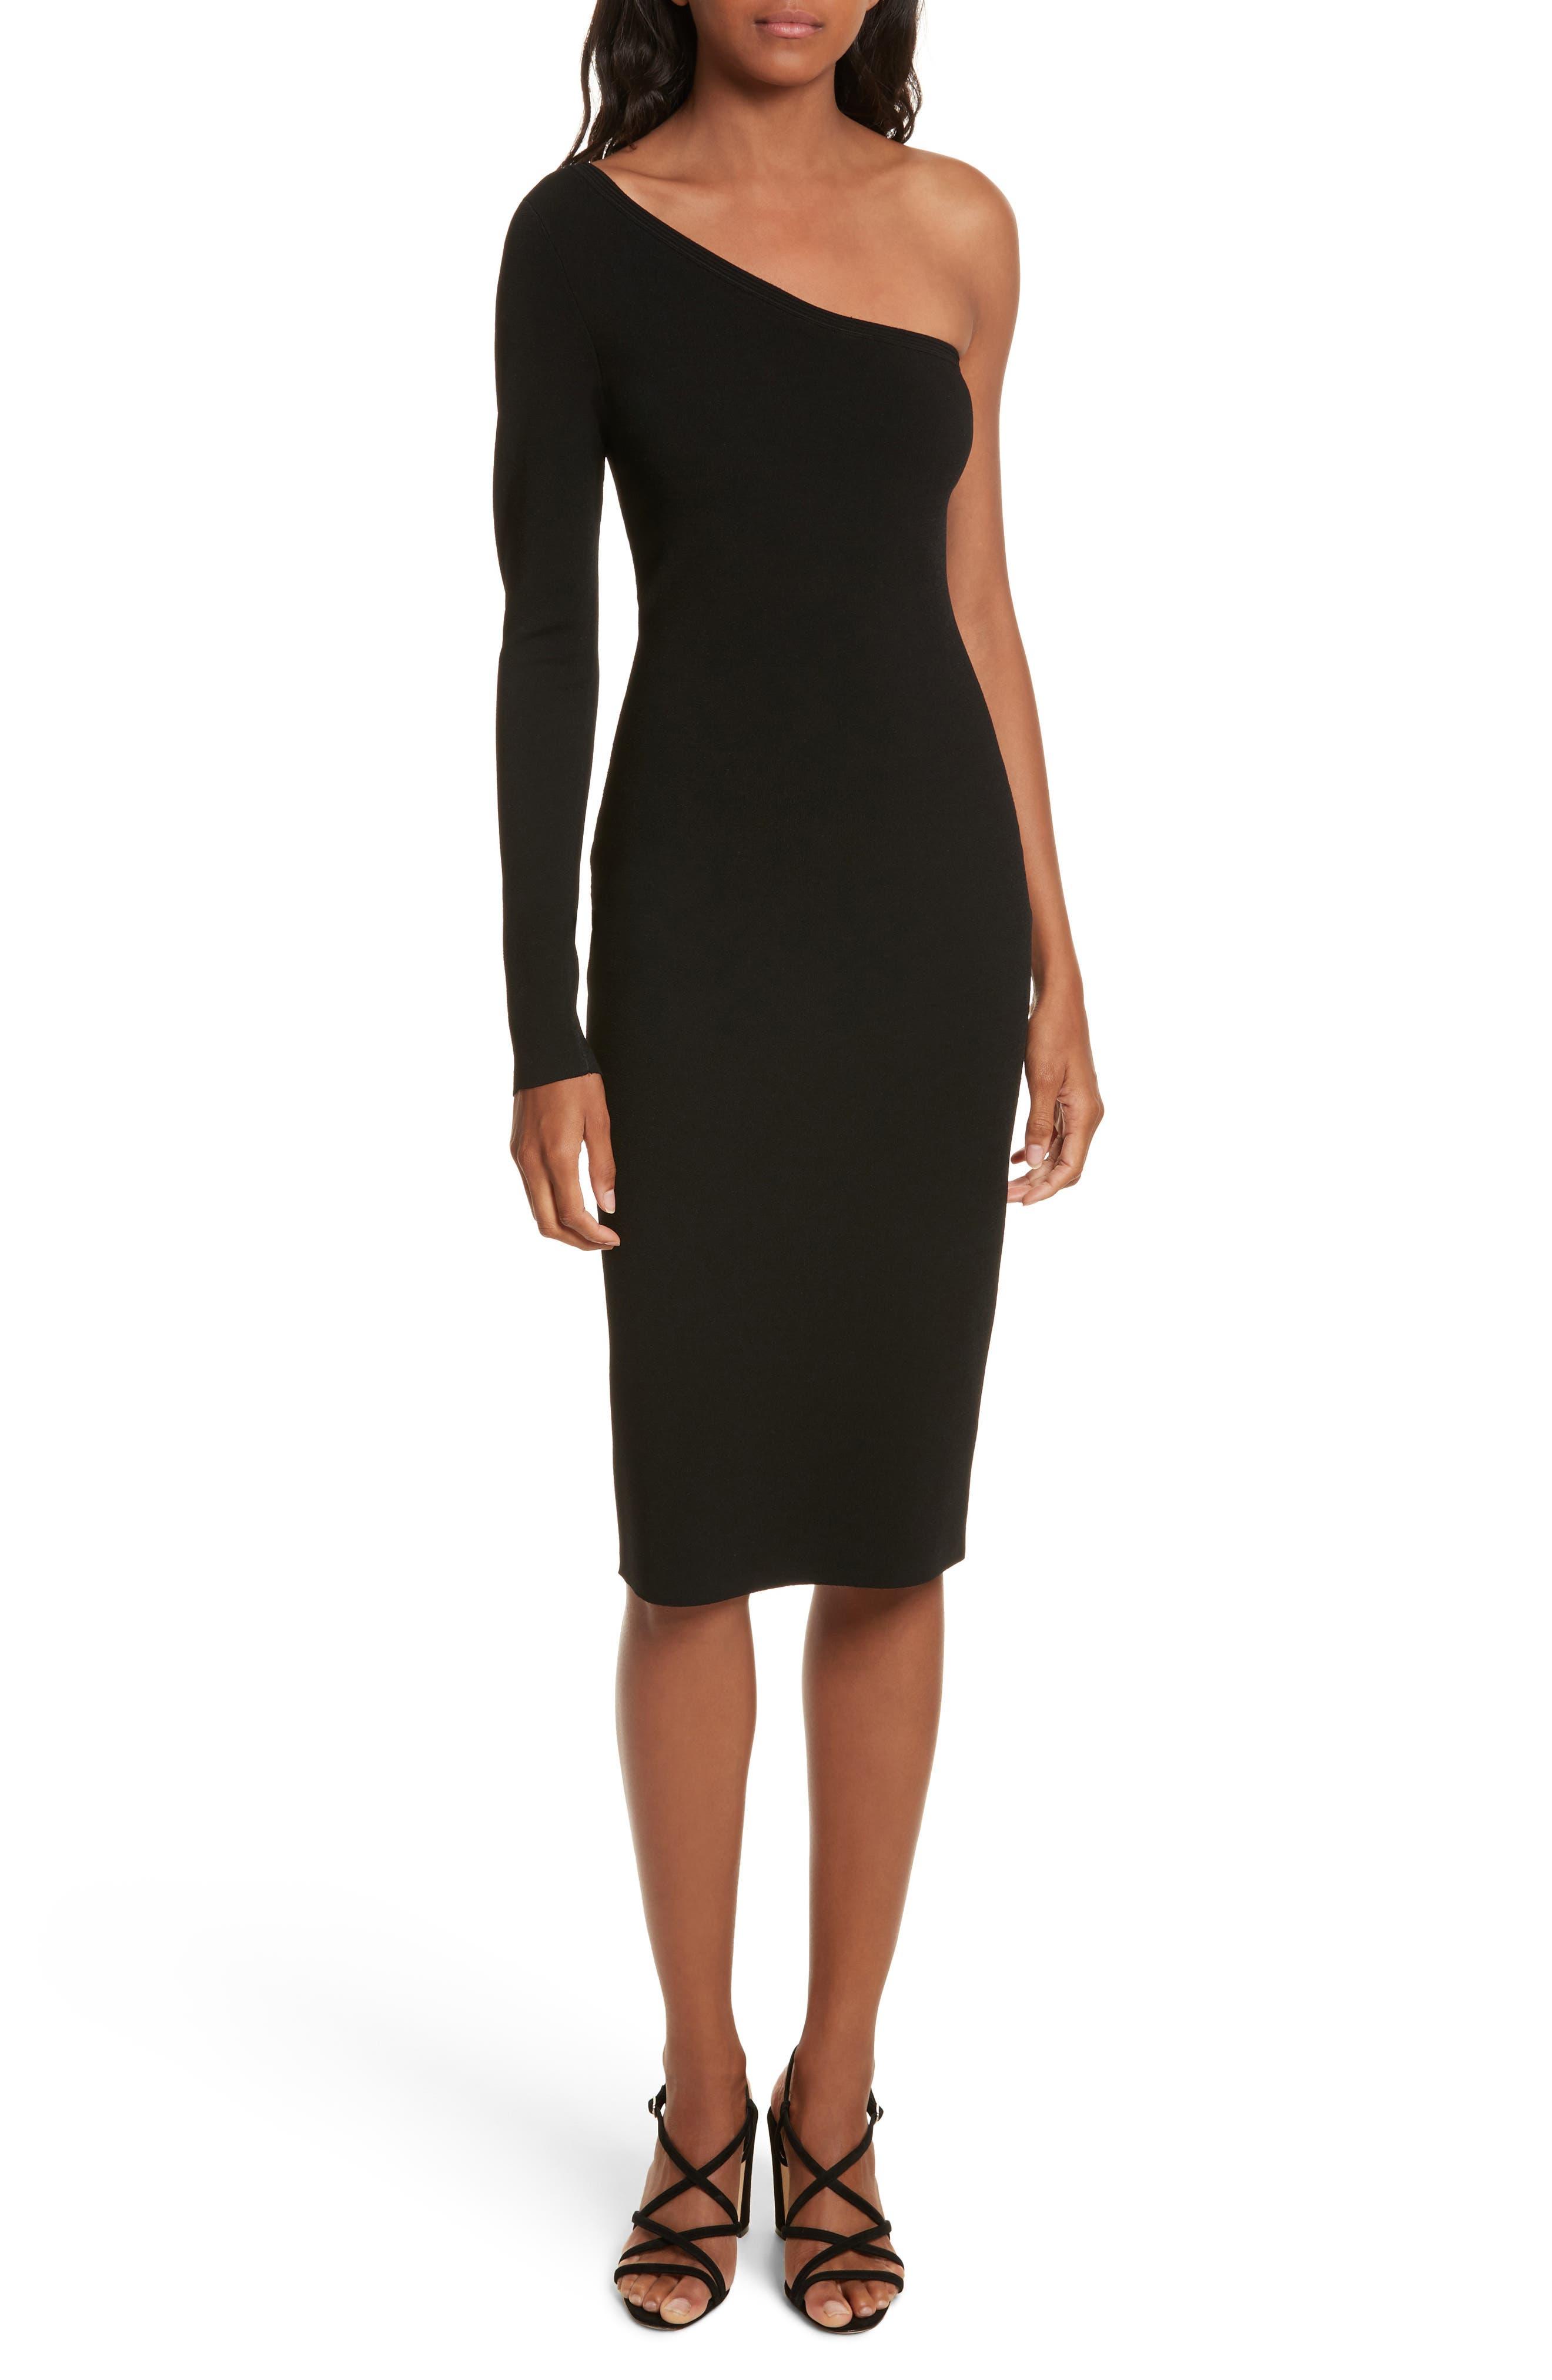 Diane von Furstenberg Knit One-Shoulder Midi Dress,                             Main thumbnail 1, color,                             Black